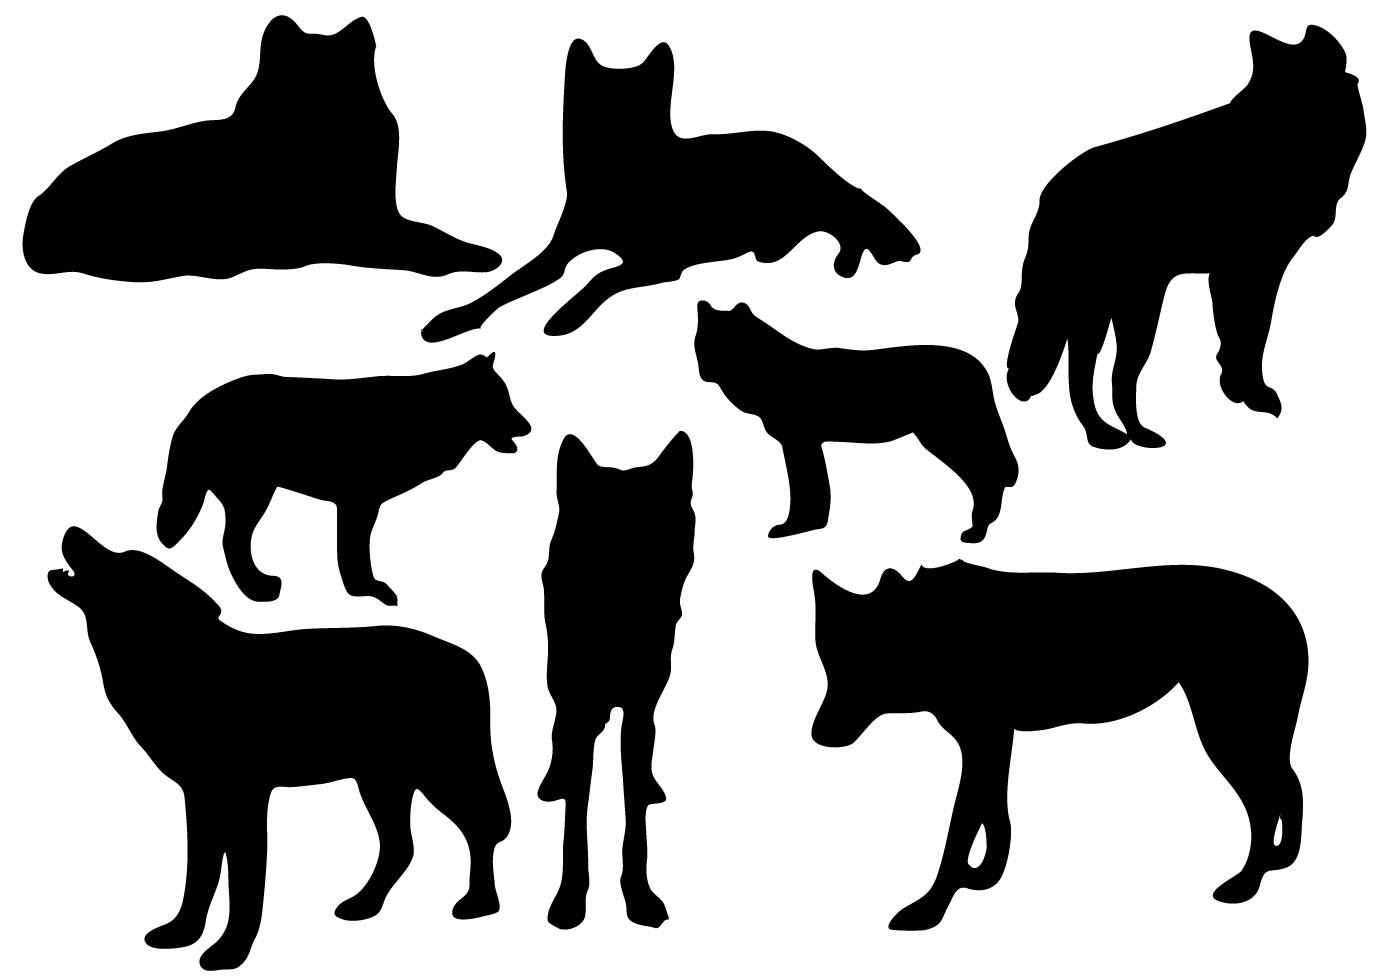 Silueta Lobo: Free Wolf Silhouette Vector